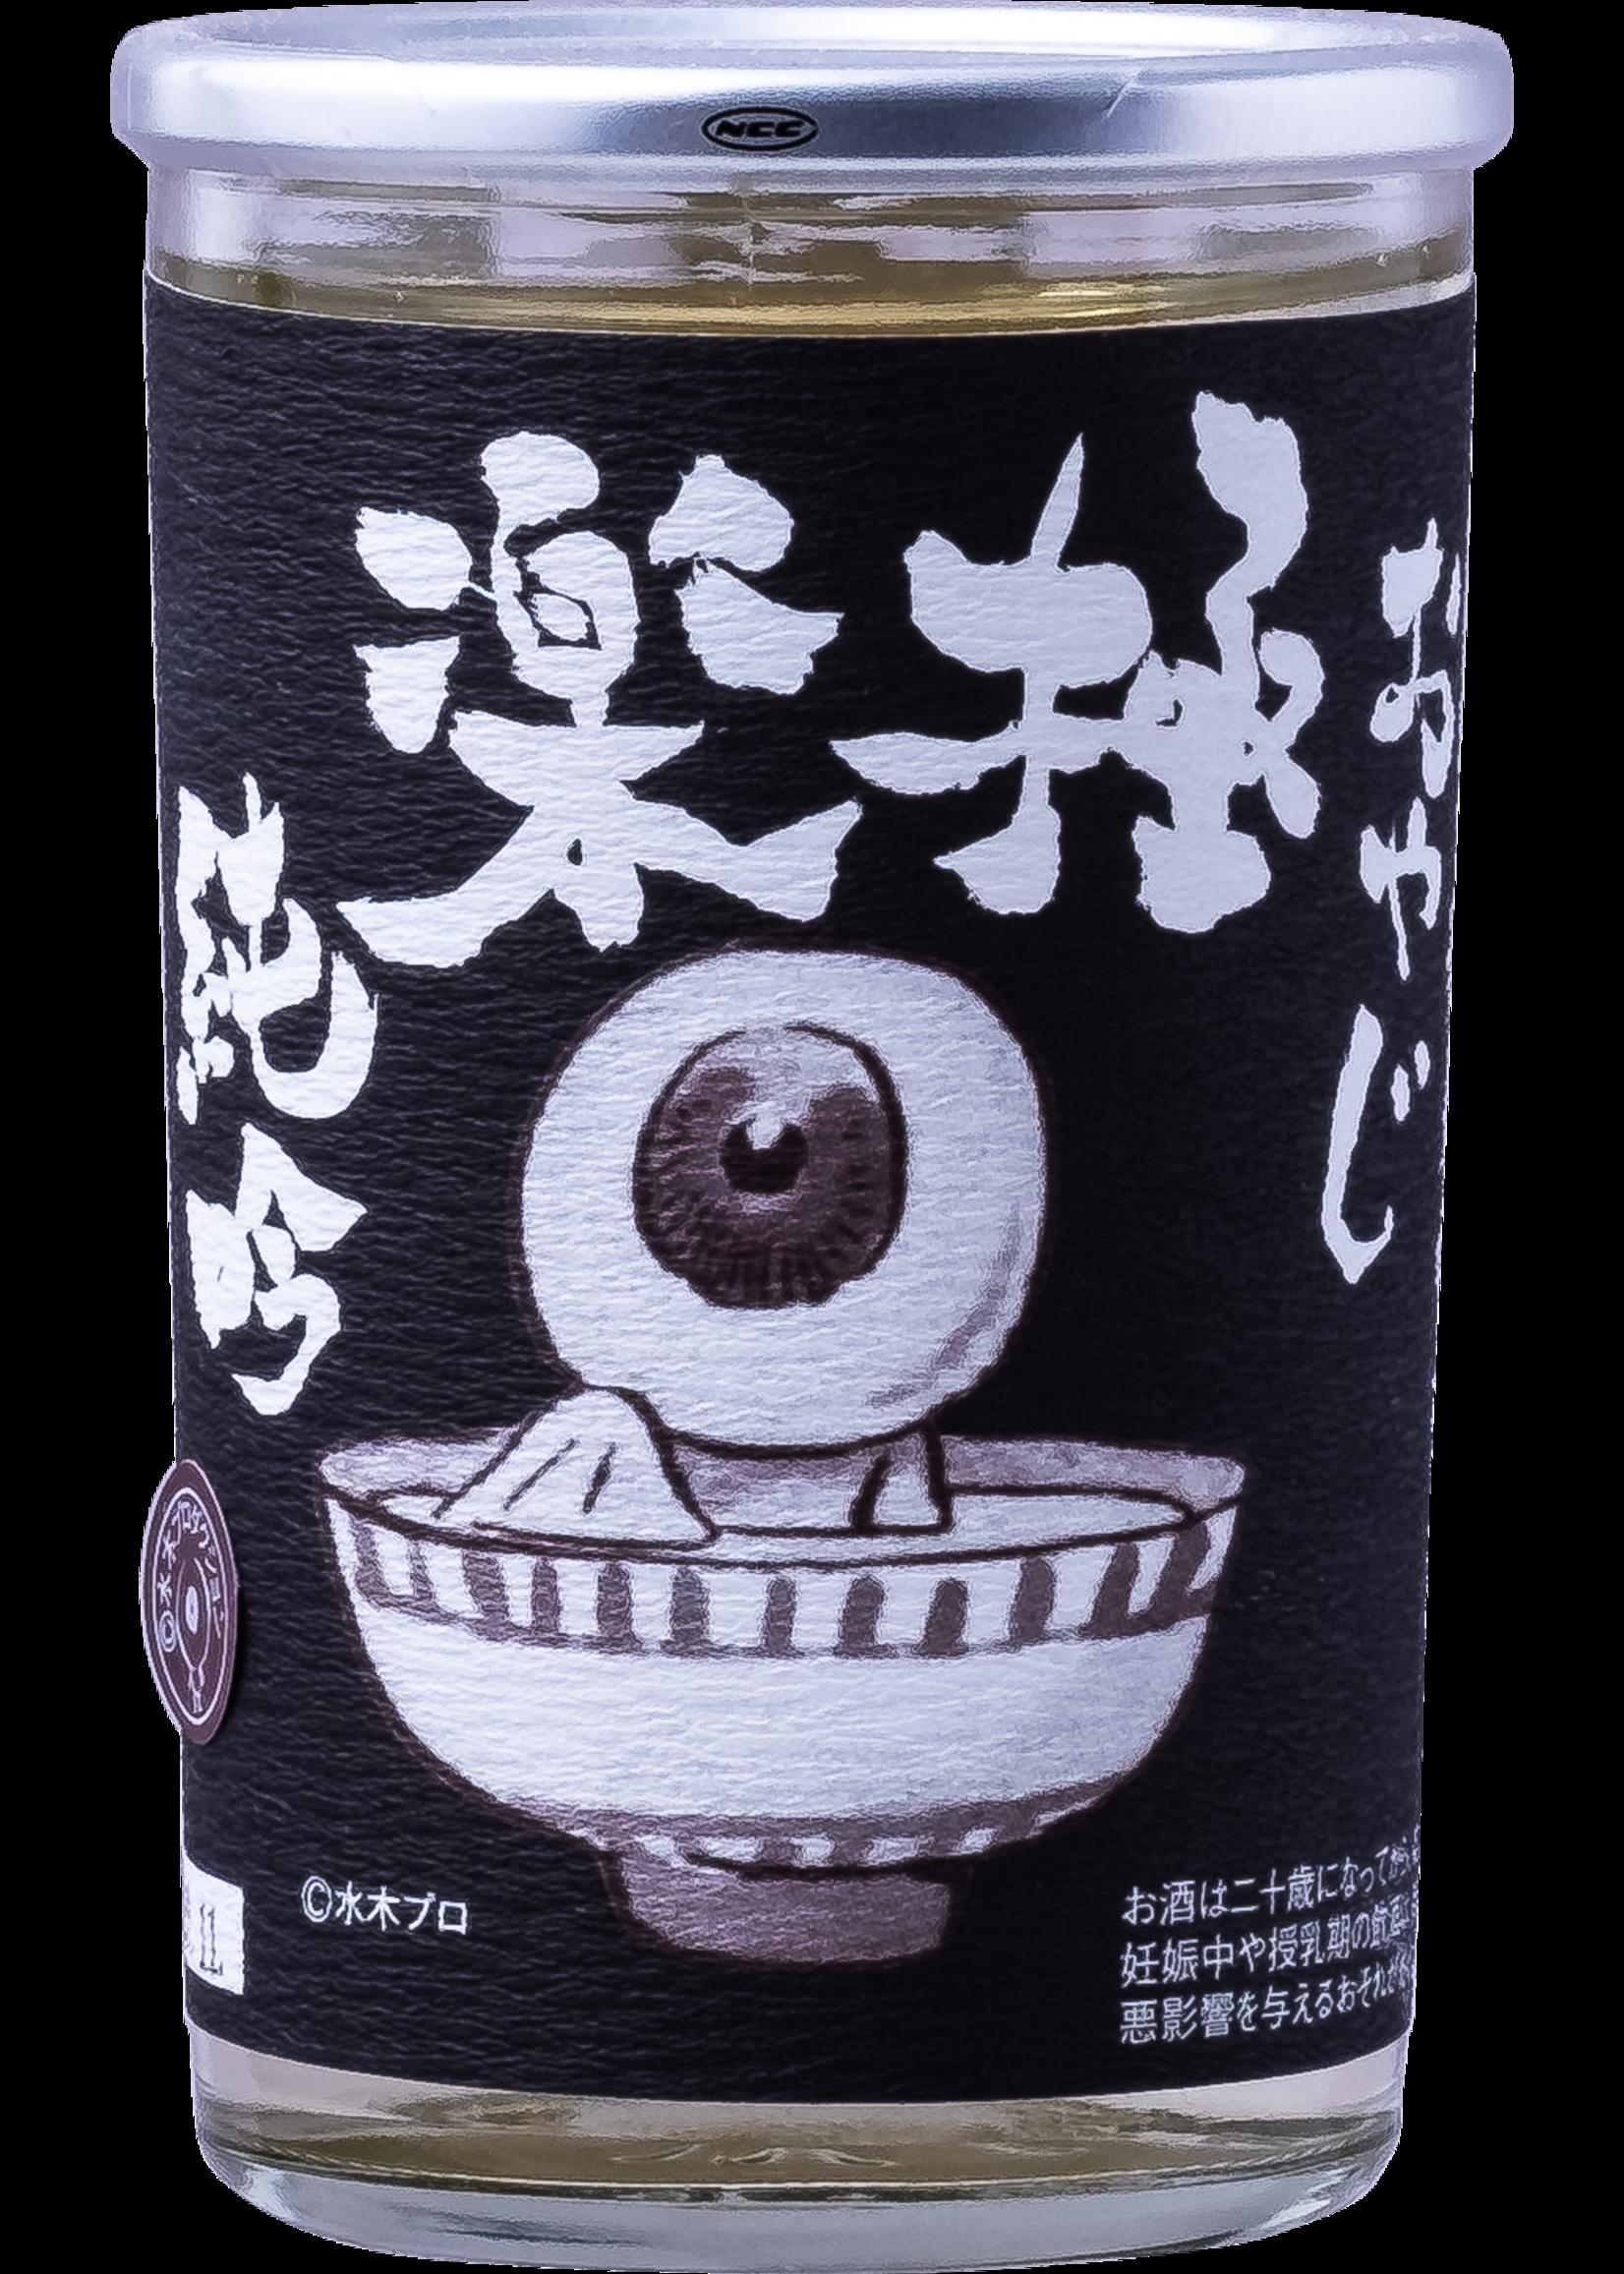 Chiyomusubi Chiyomusubi / Oyaji Gokuraku Sake Cup Junmai Ginjo / 180mL